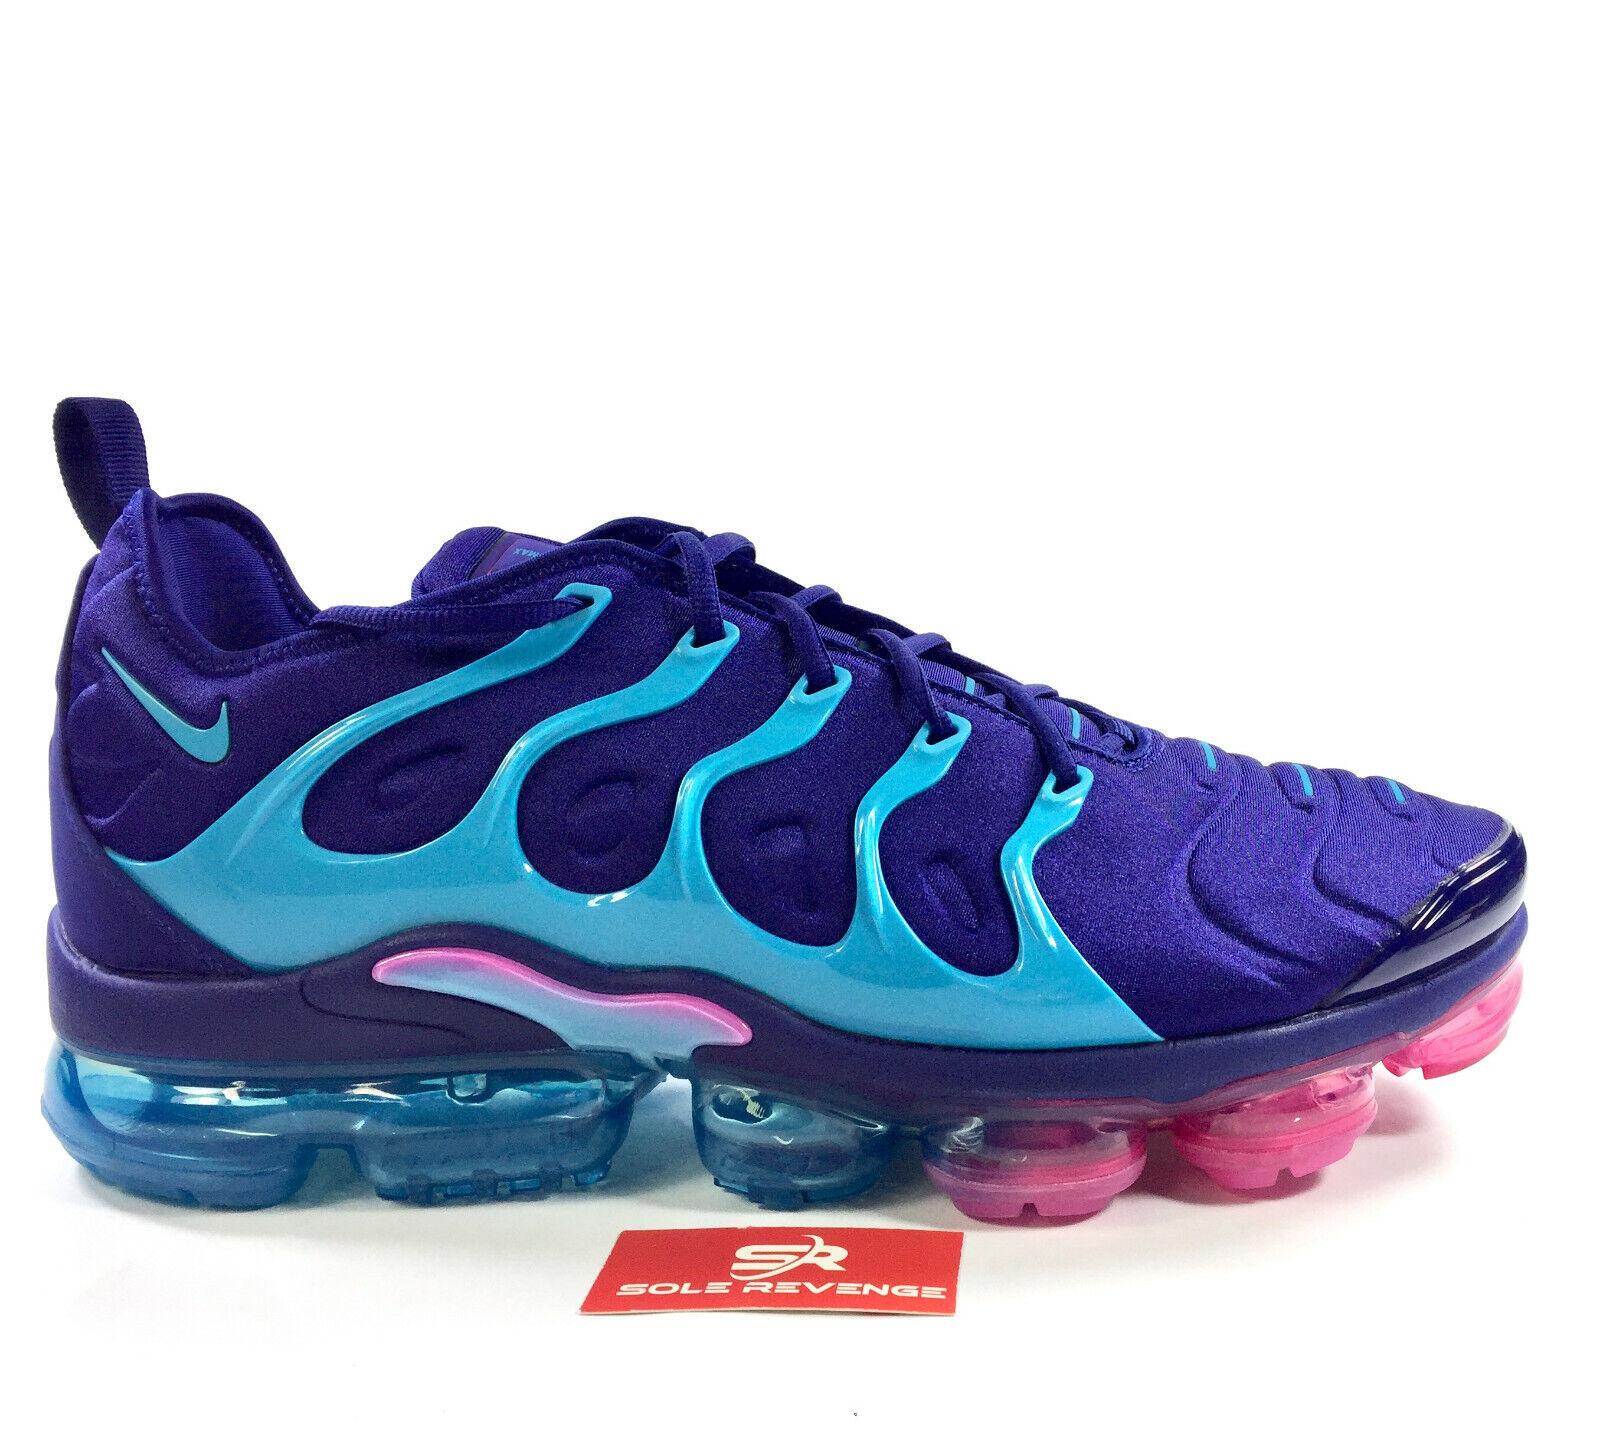 New Nike Air Vapormax Plus - V6079500  Regency Purple Light bluee Fury c1